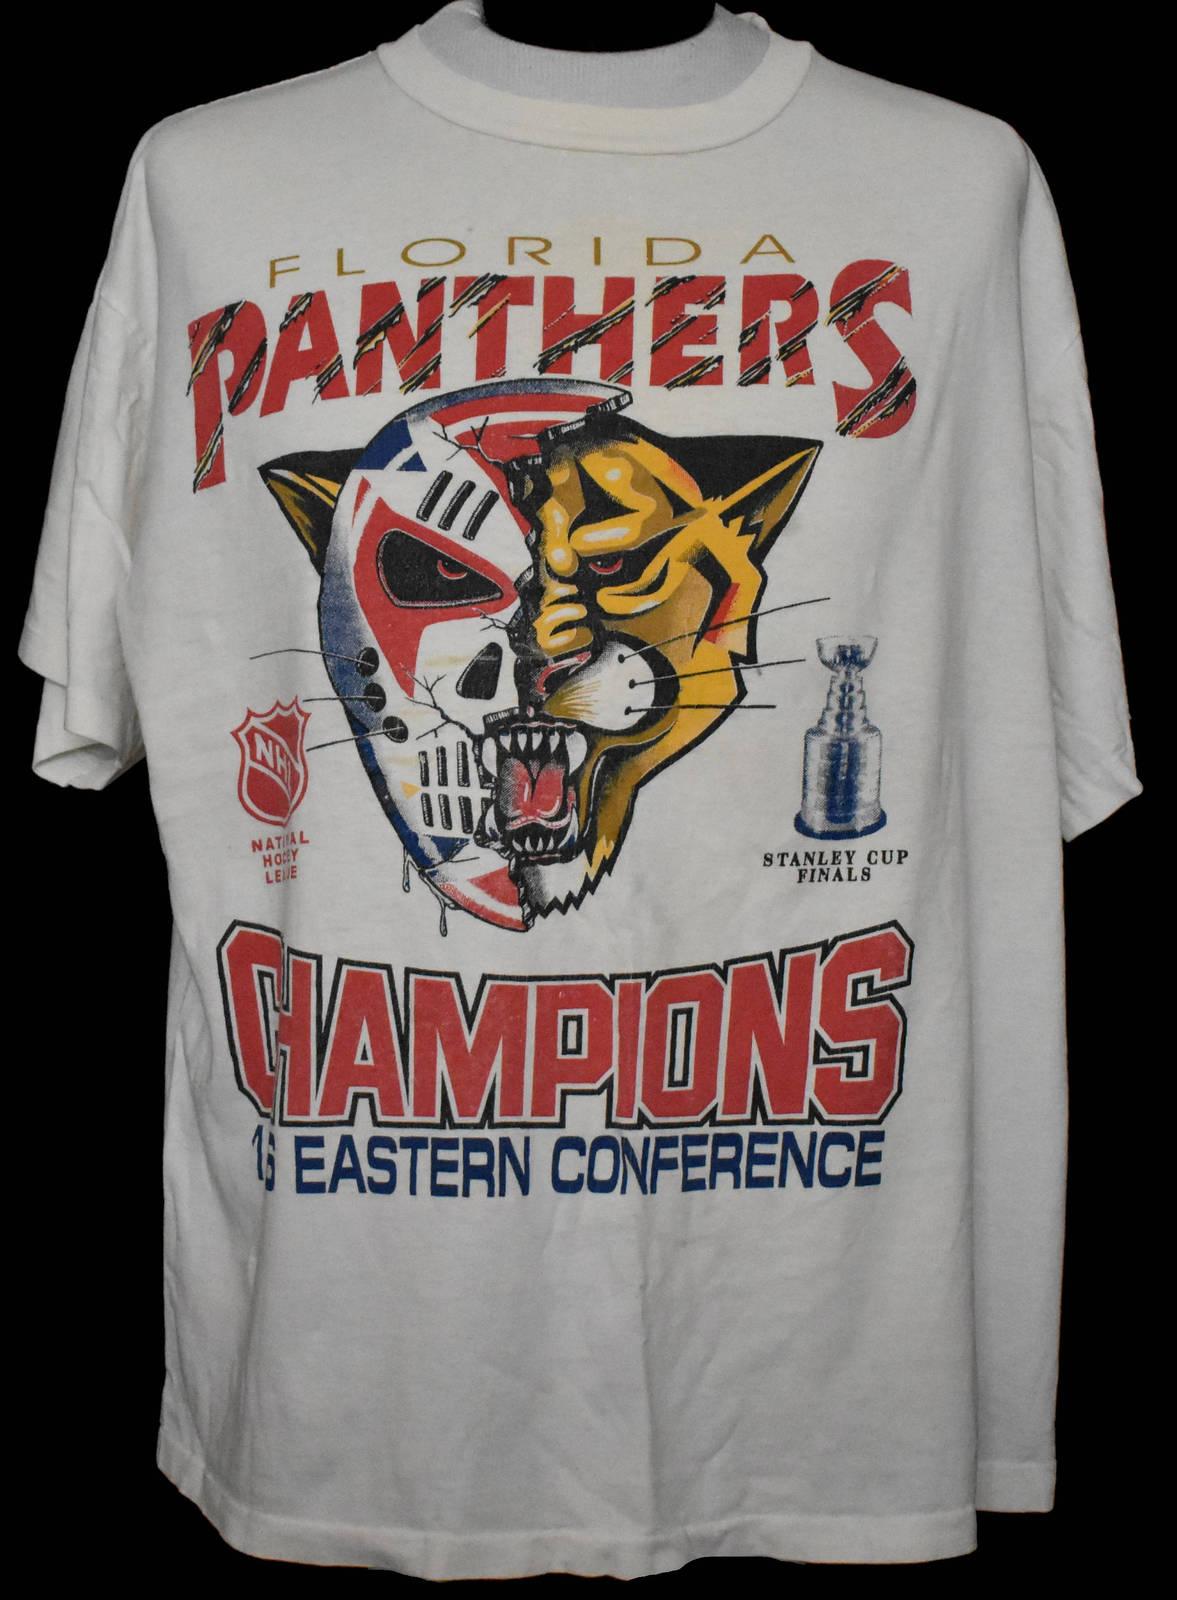 Vintage 90s Florida Panthers T-shirt and 50 similar items